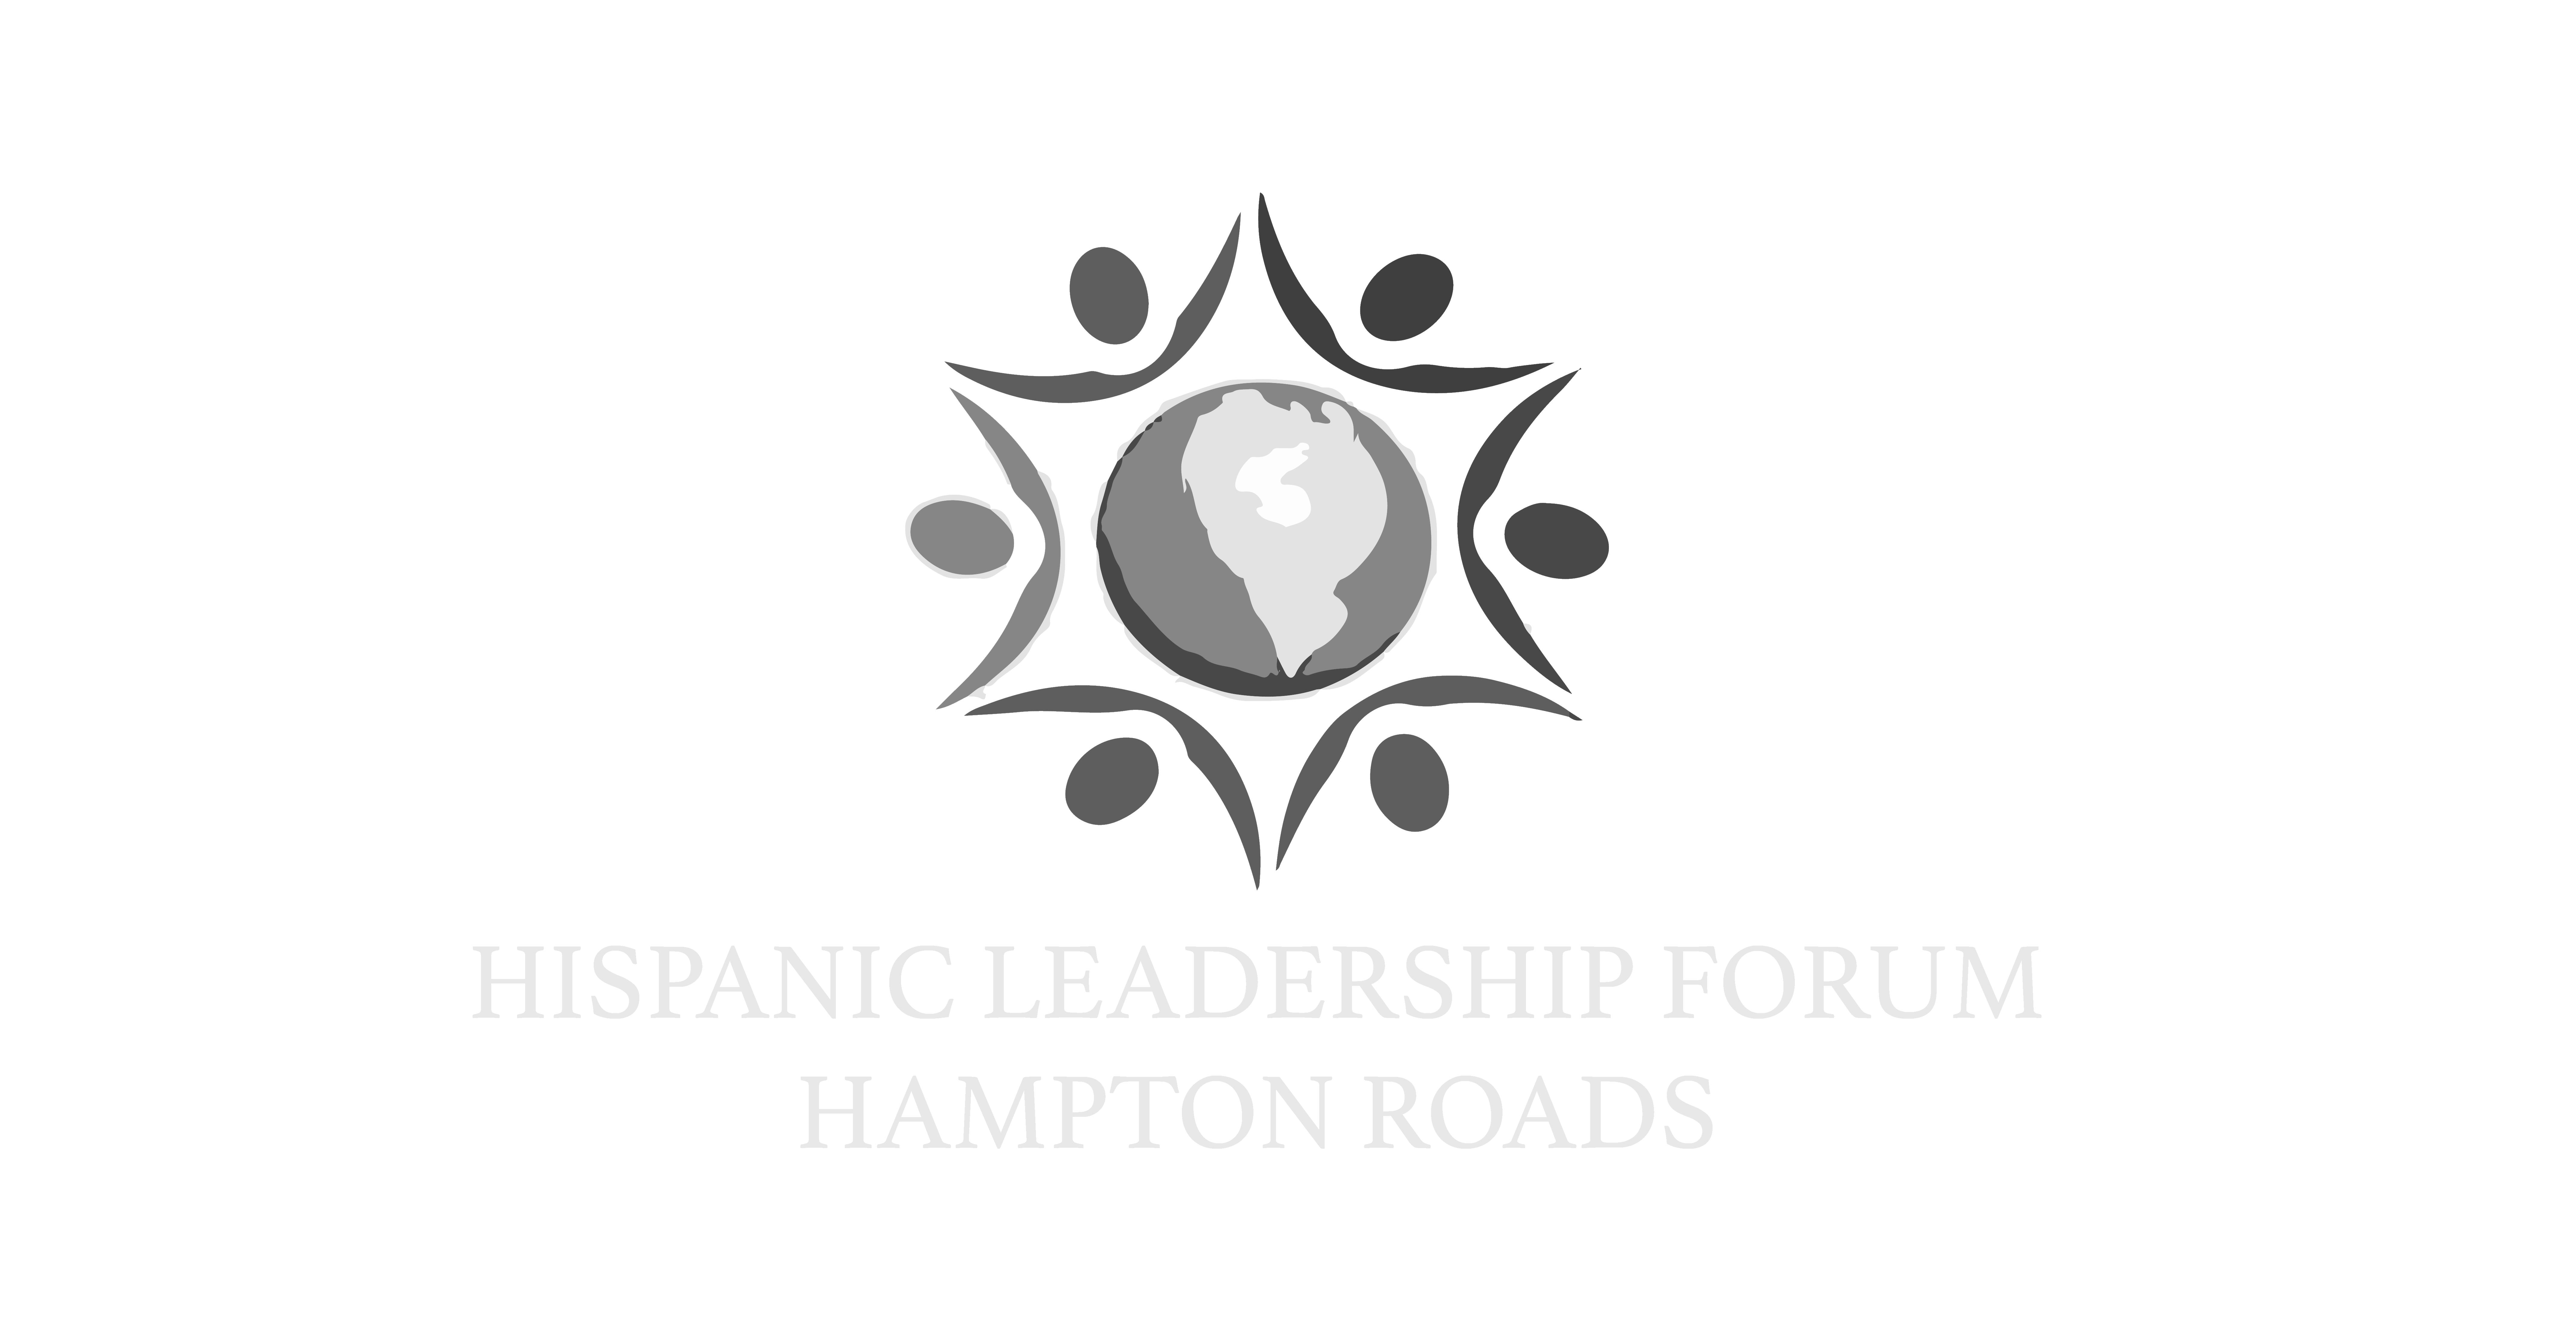 HISPANIC LEADERSHIP FORUM FEATURE